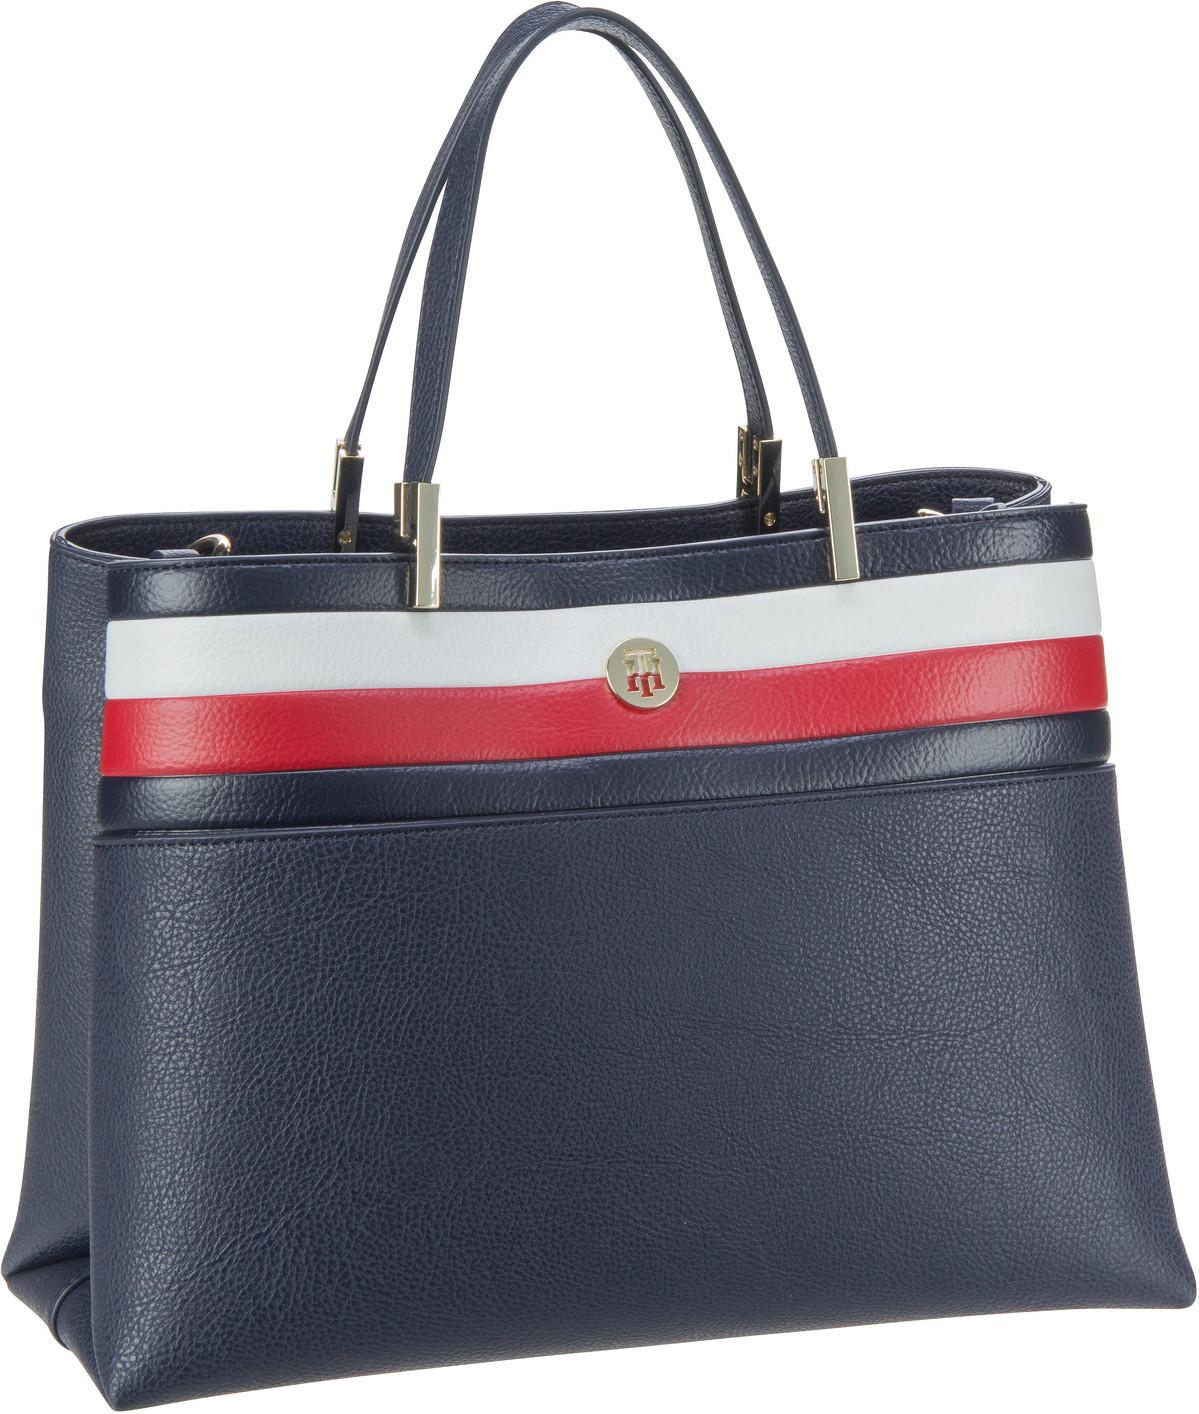 Handtasche TH Core Satchel Corp SP20 Corporate Blue